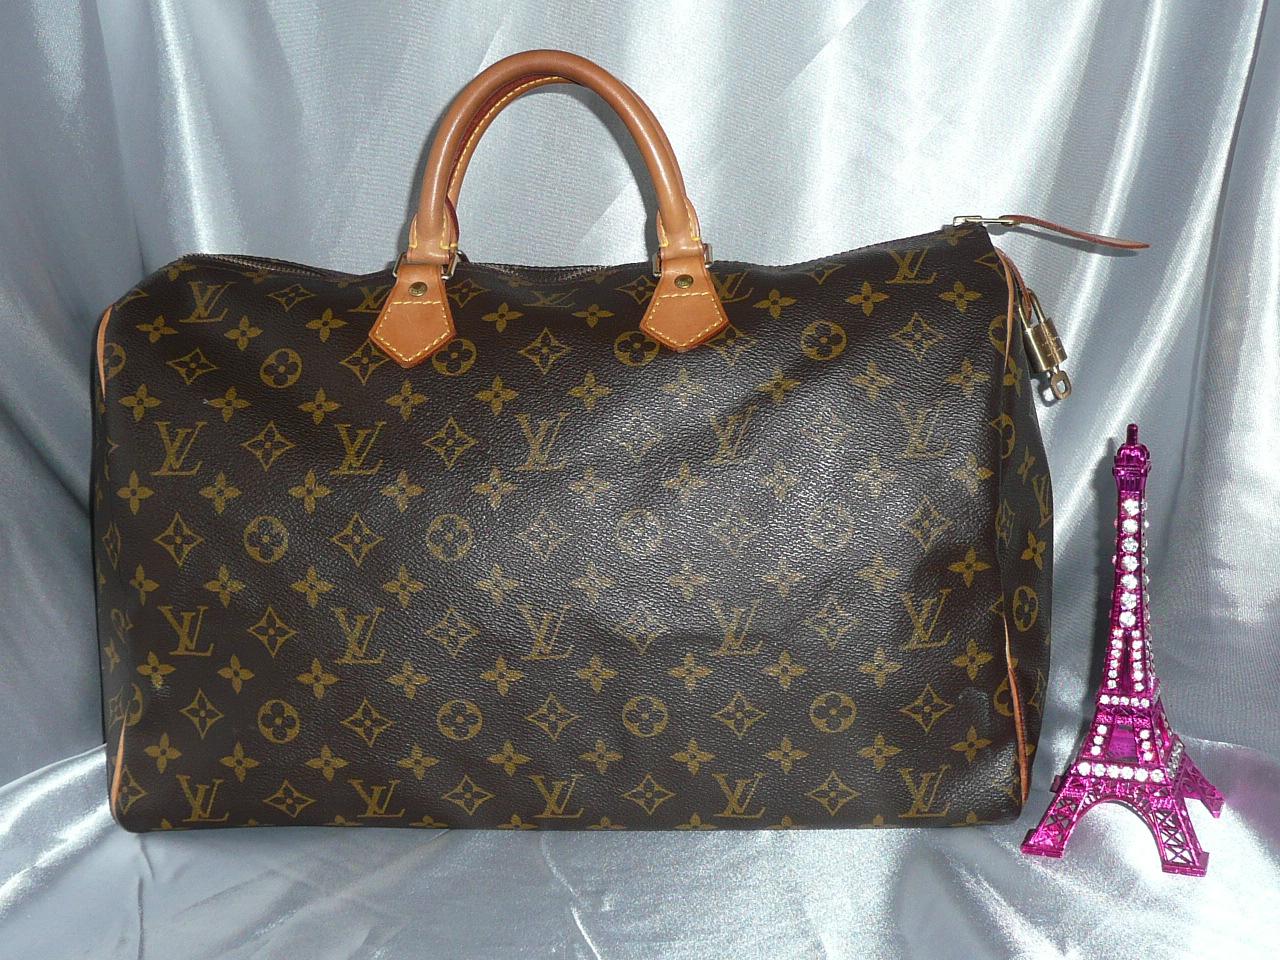 Sac Louis Vuitton Speedy 40